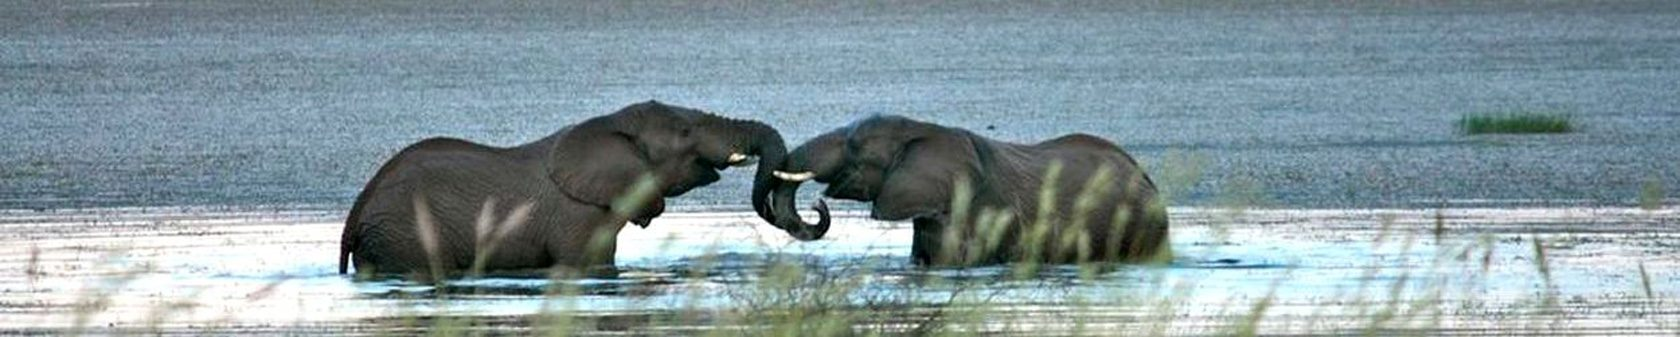 Elephants-swimming-news